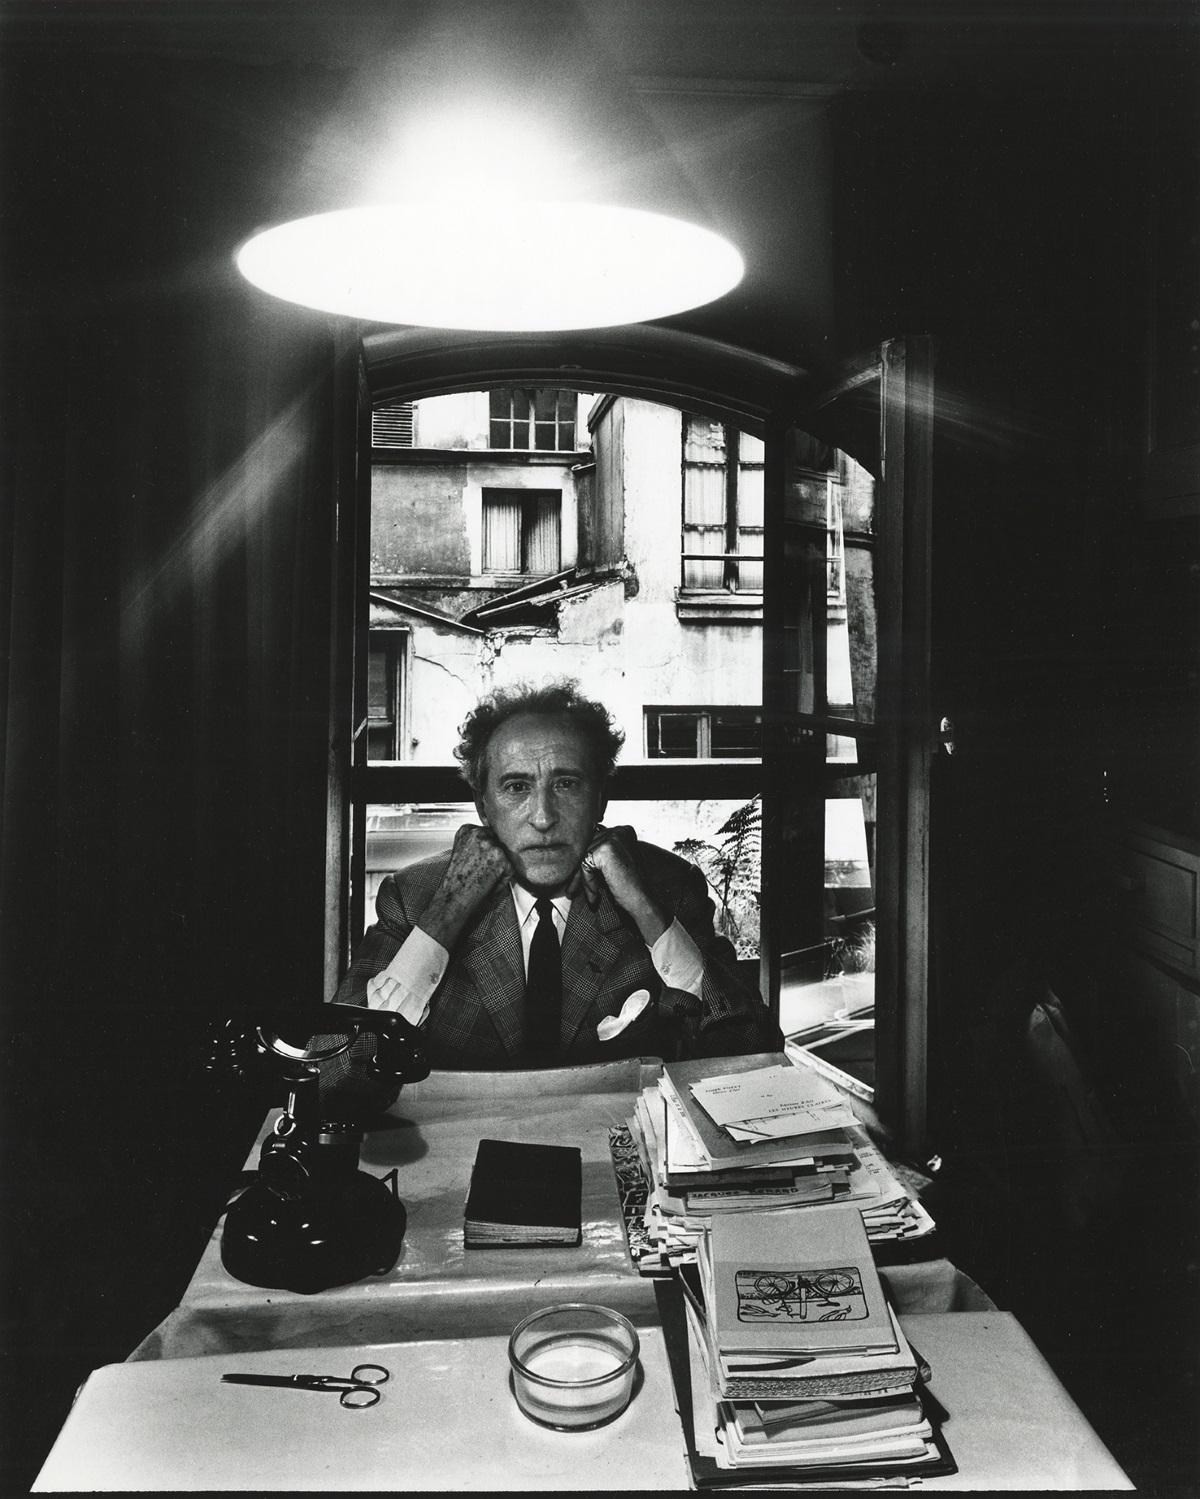 Поетът Жан Кокто (1960 г.). Той ефренскипоет,писател,дизайнер,художник,скулптор,сценарист,актьорирежисьор.Неговият кръг от приятели и любовници включваПабло Пикасо,Жан Юго,Жан Маре,Марлене Дитрих...